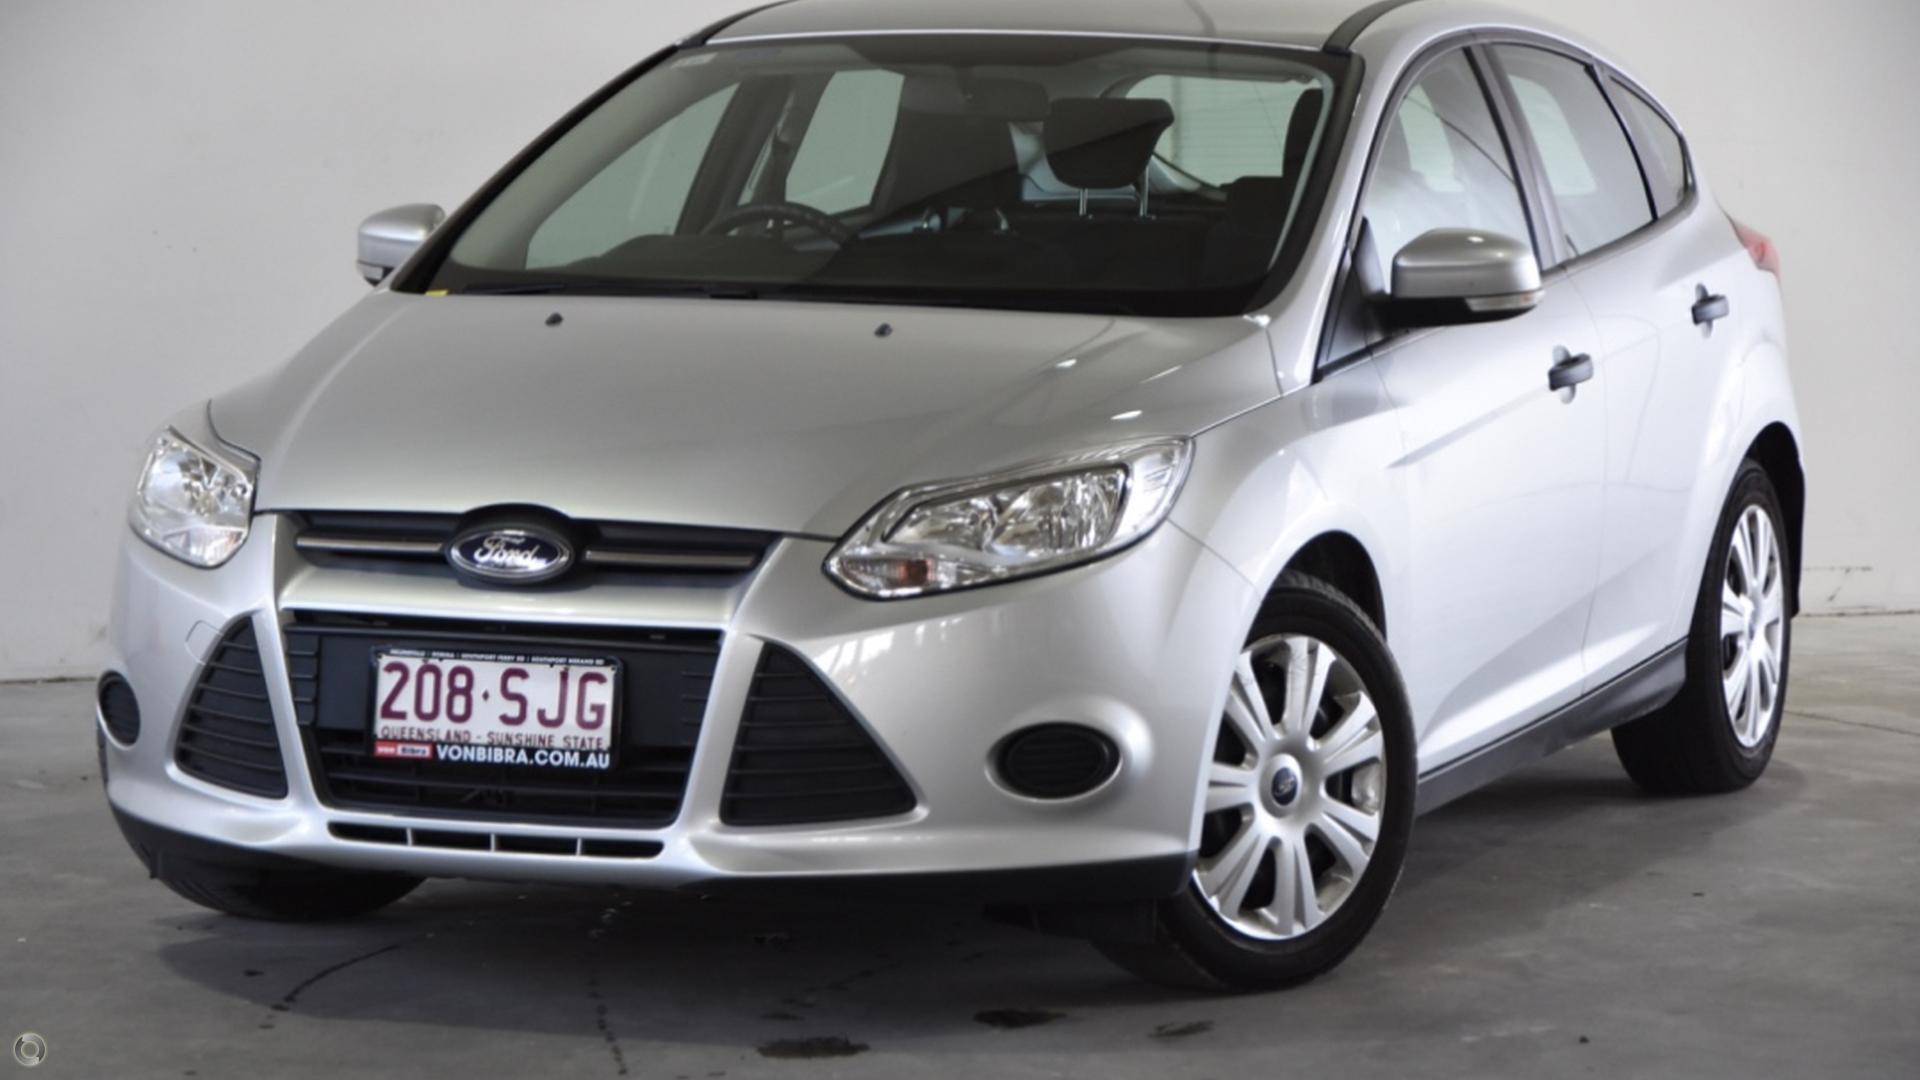 2012 Ford Focus LW